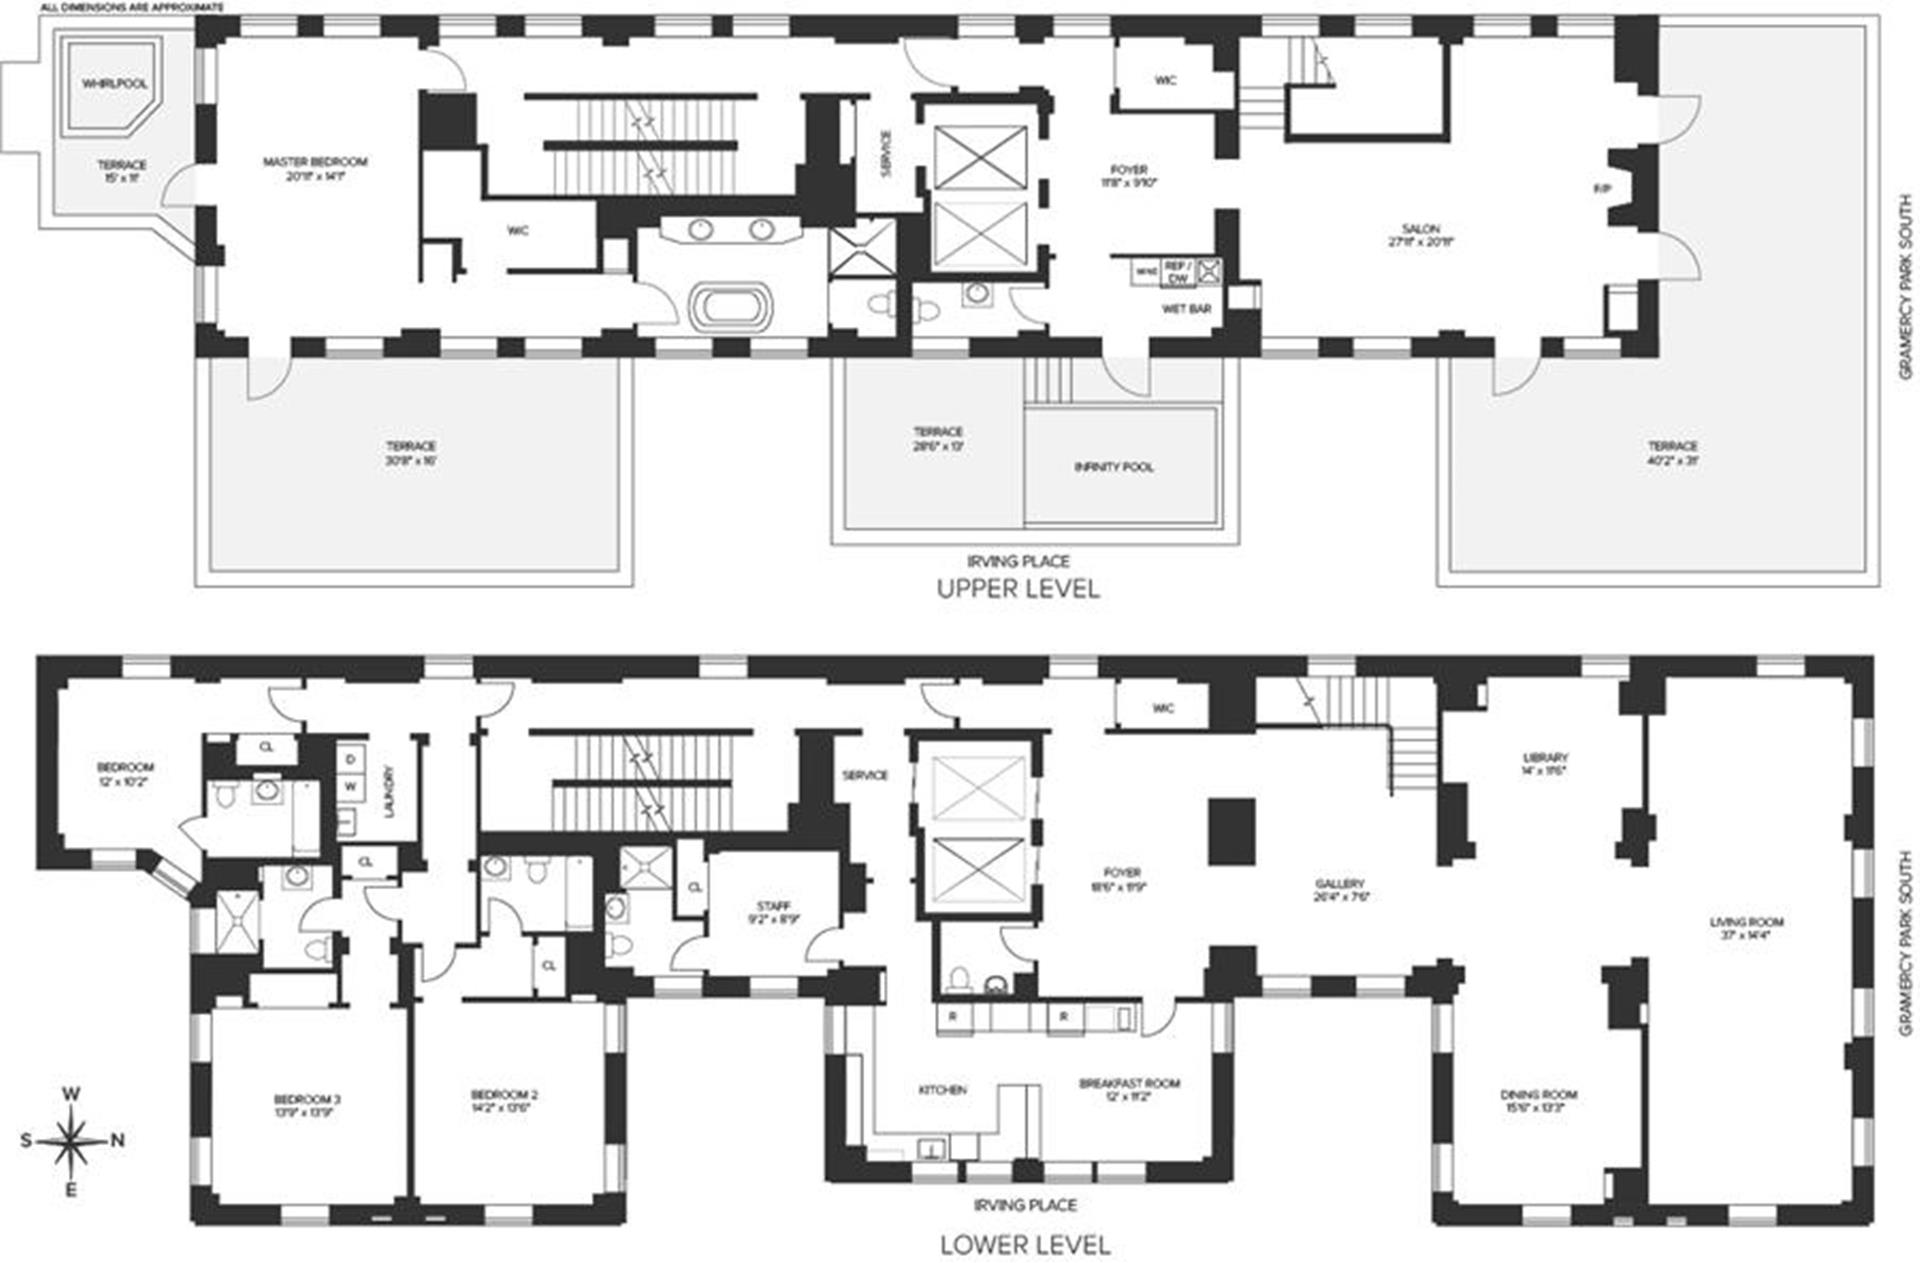 Floor plan of 18 Gramercy Park South, PH - Gramercy - Union Square, New York